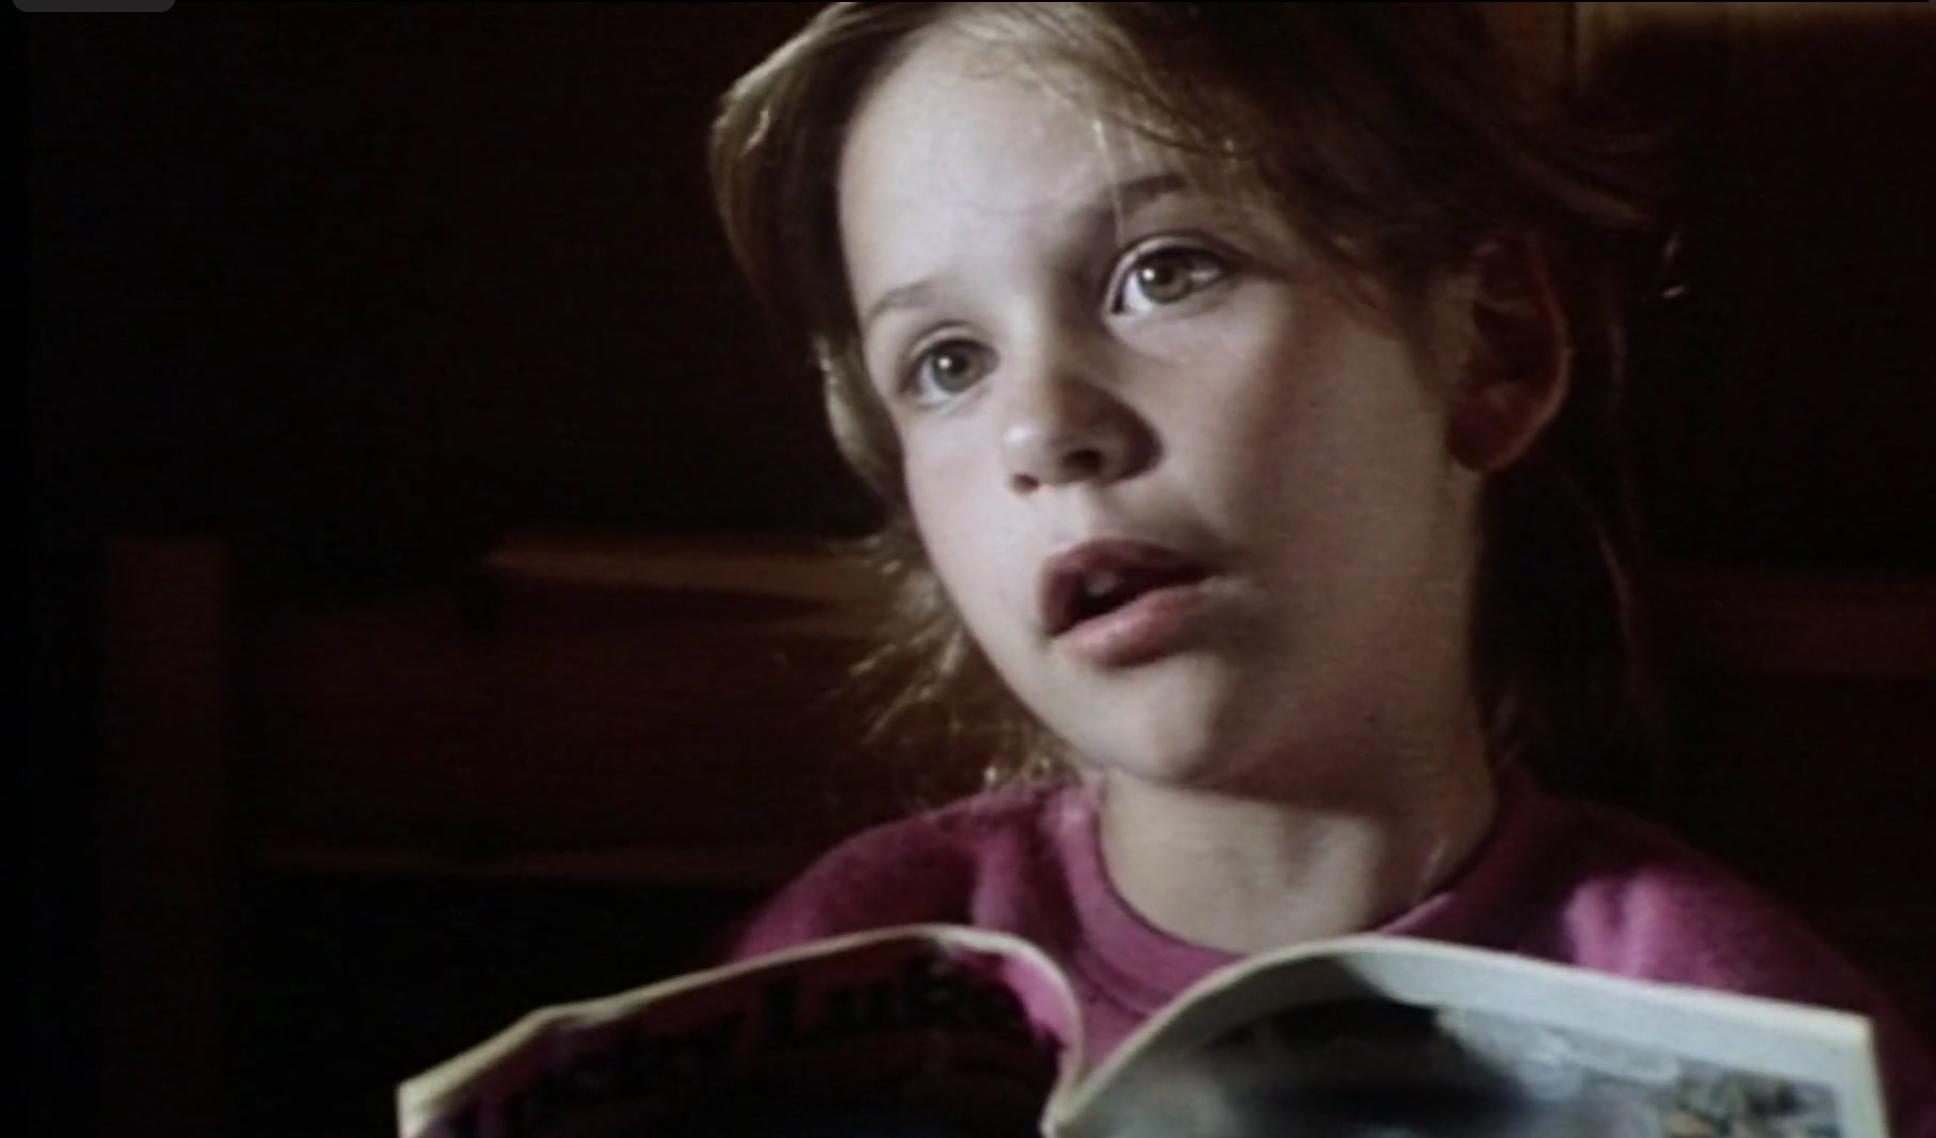 Amalie Ihle Alstrup in Miraklet i Valby (1989)